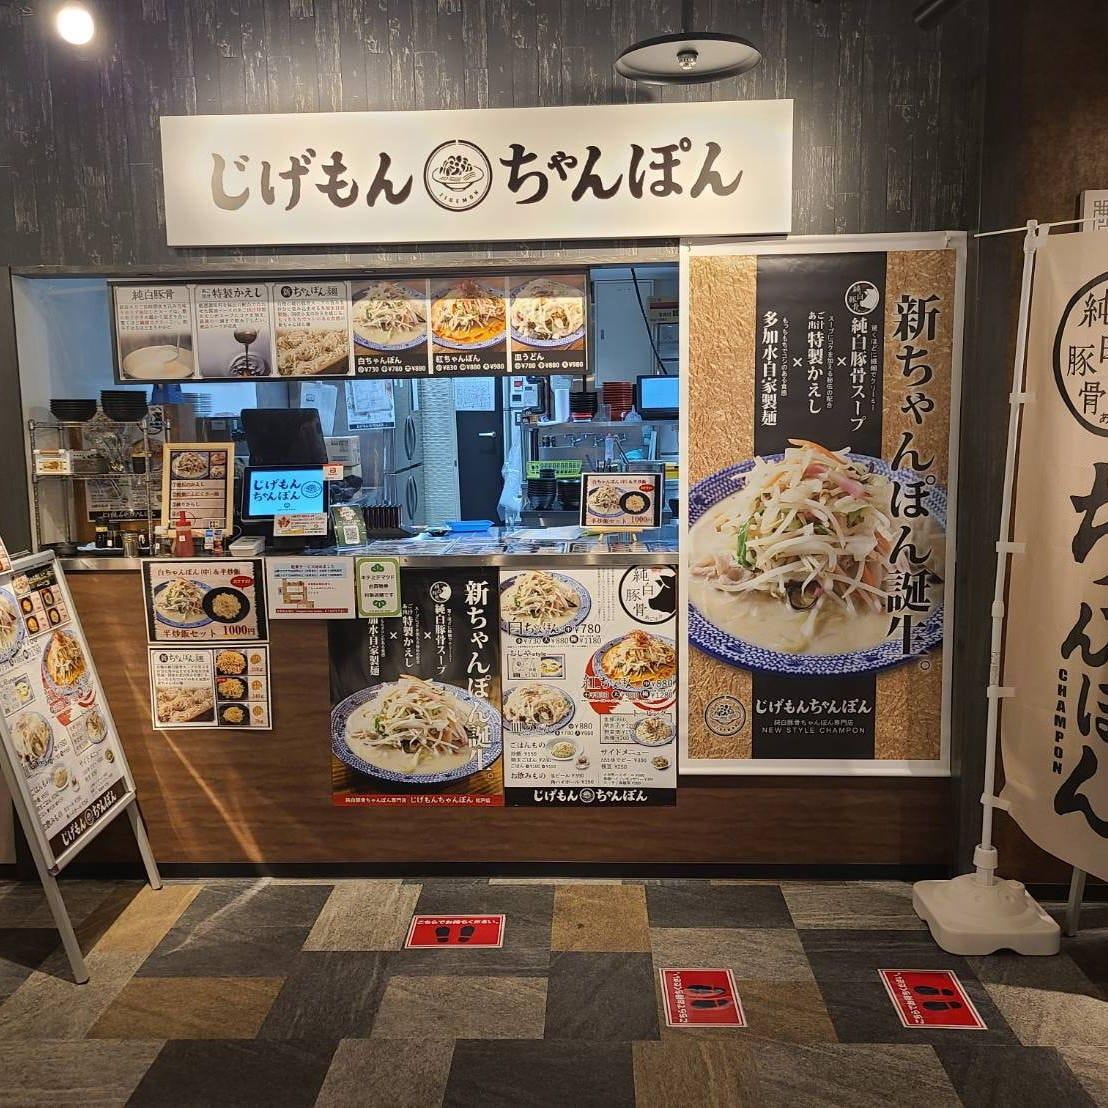 KITE MITE MATSUDO10階にOPEN!